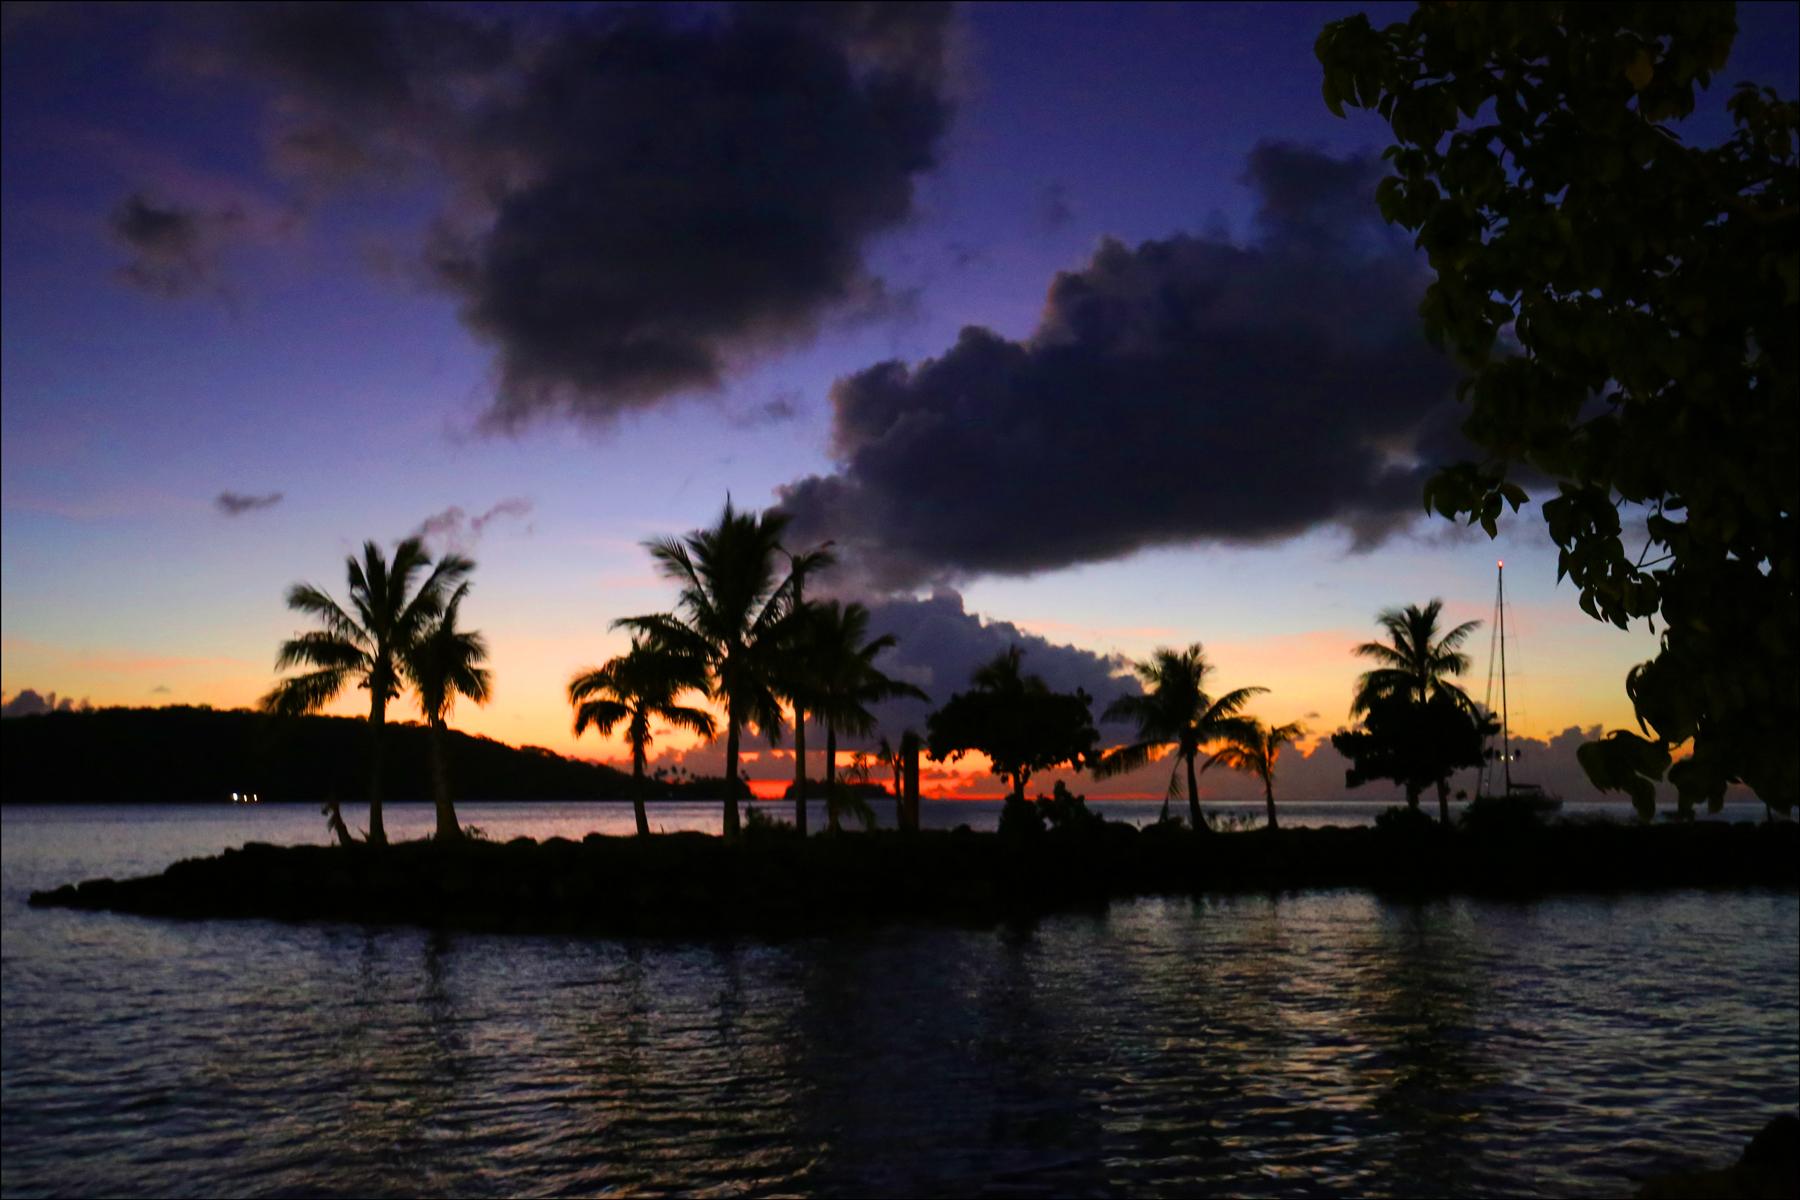 Sunset from the Beach of Bora Bora